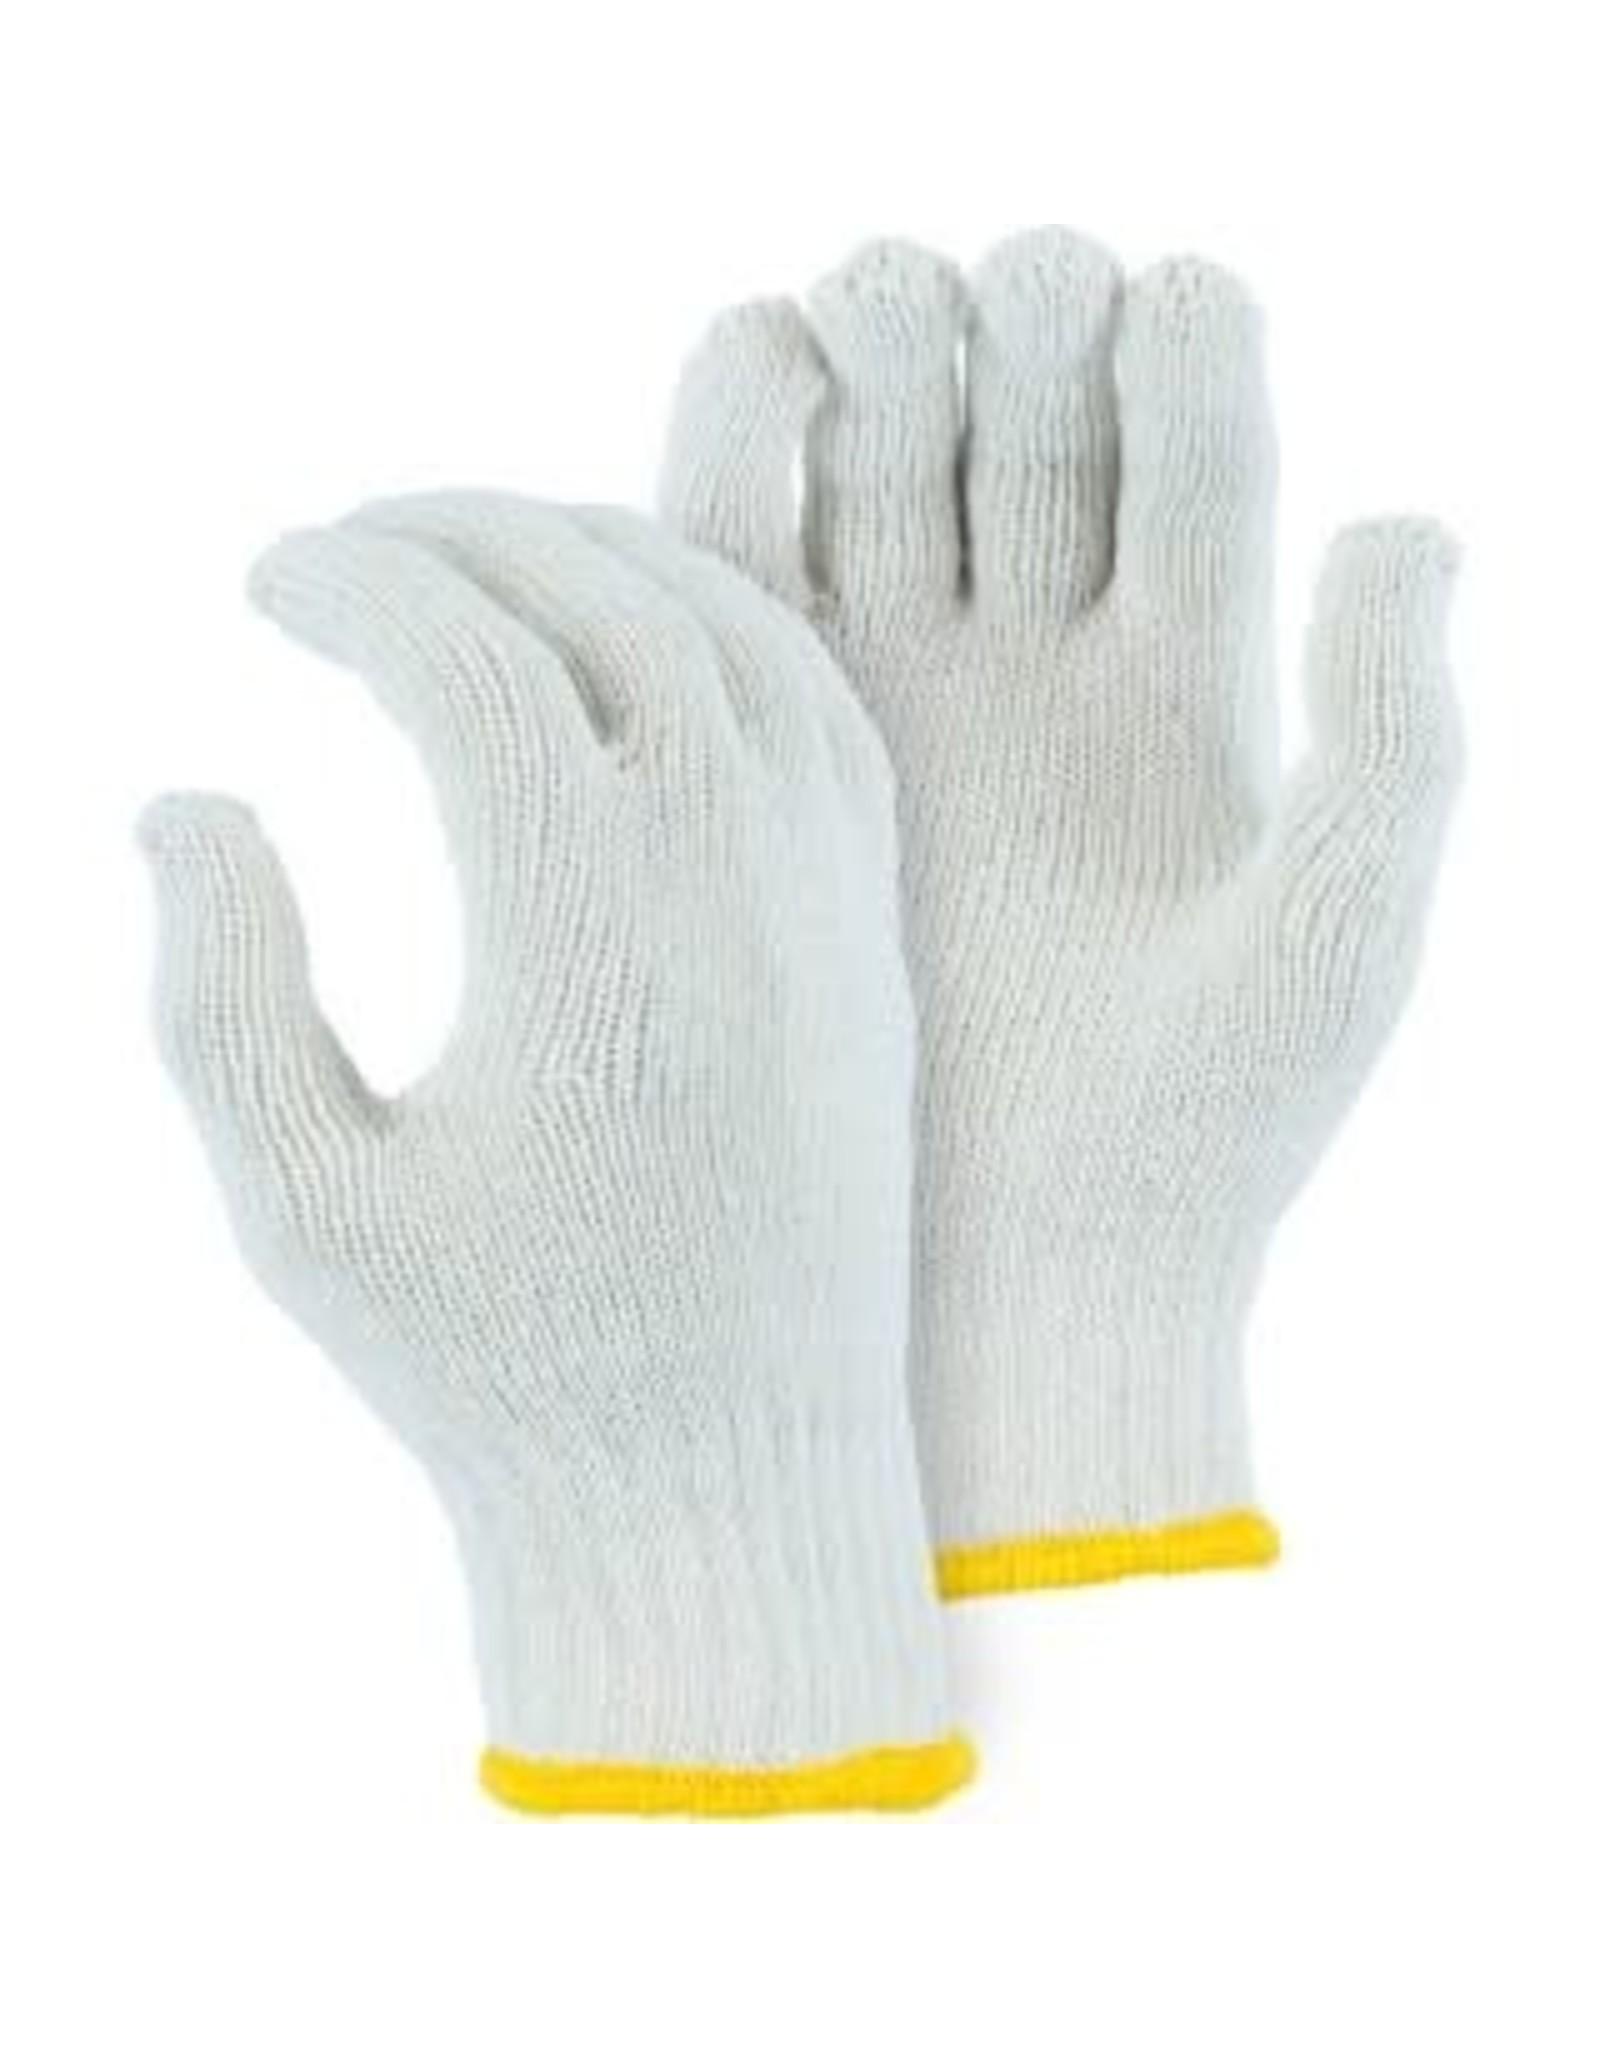 Majestic Glove Heavyweight Cotton/Poly String Knit Glove, White